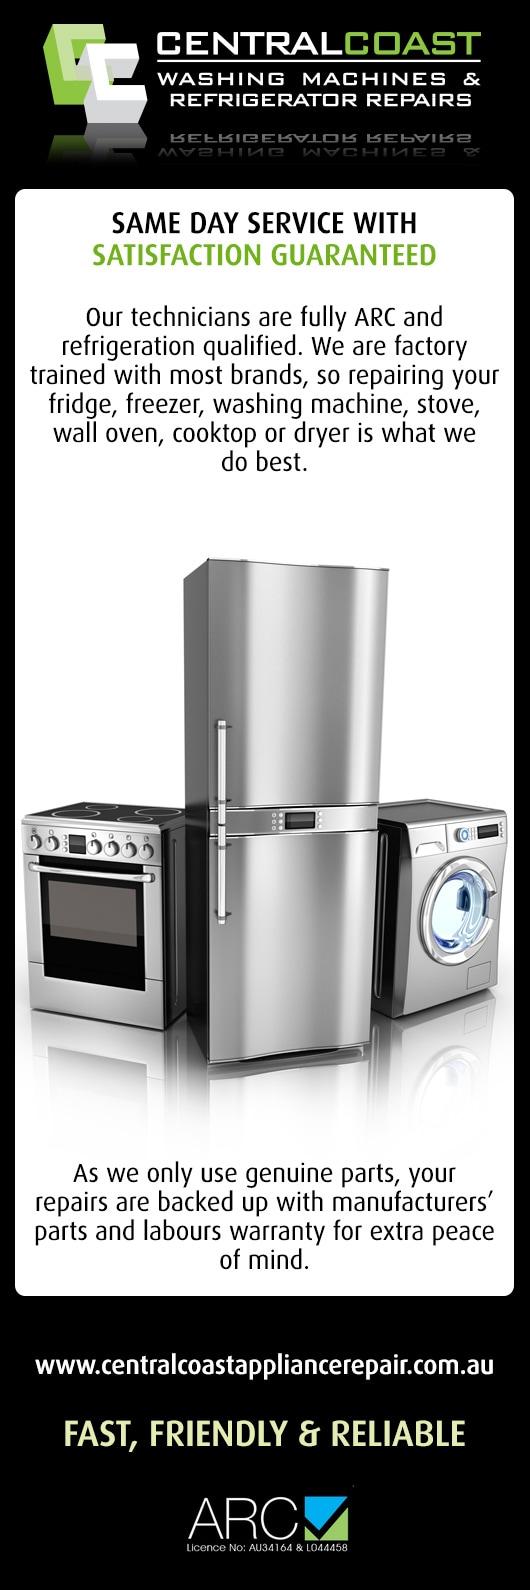 Kitchen Appliance Repairs Central Coast Washing Machines Refrigerator Repairs Washing